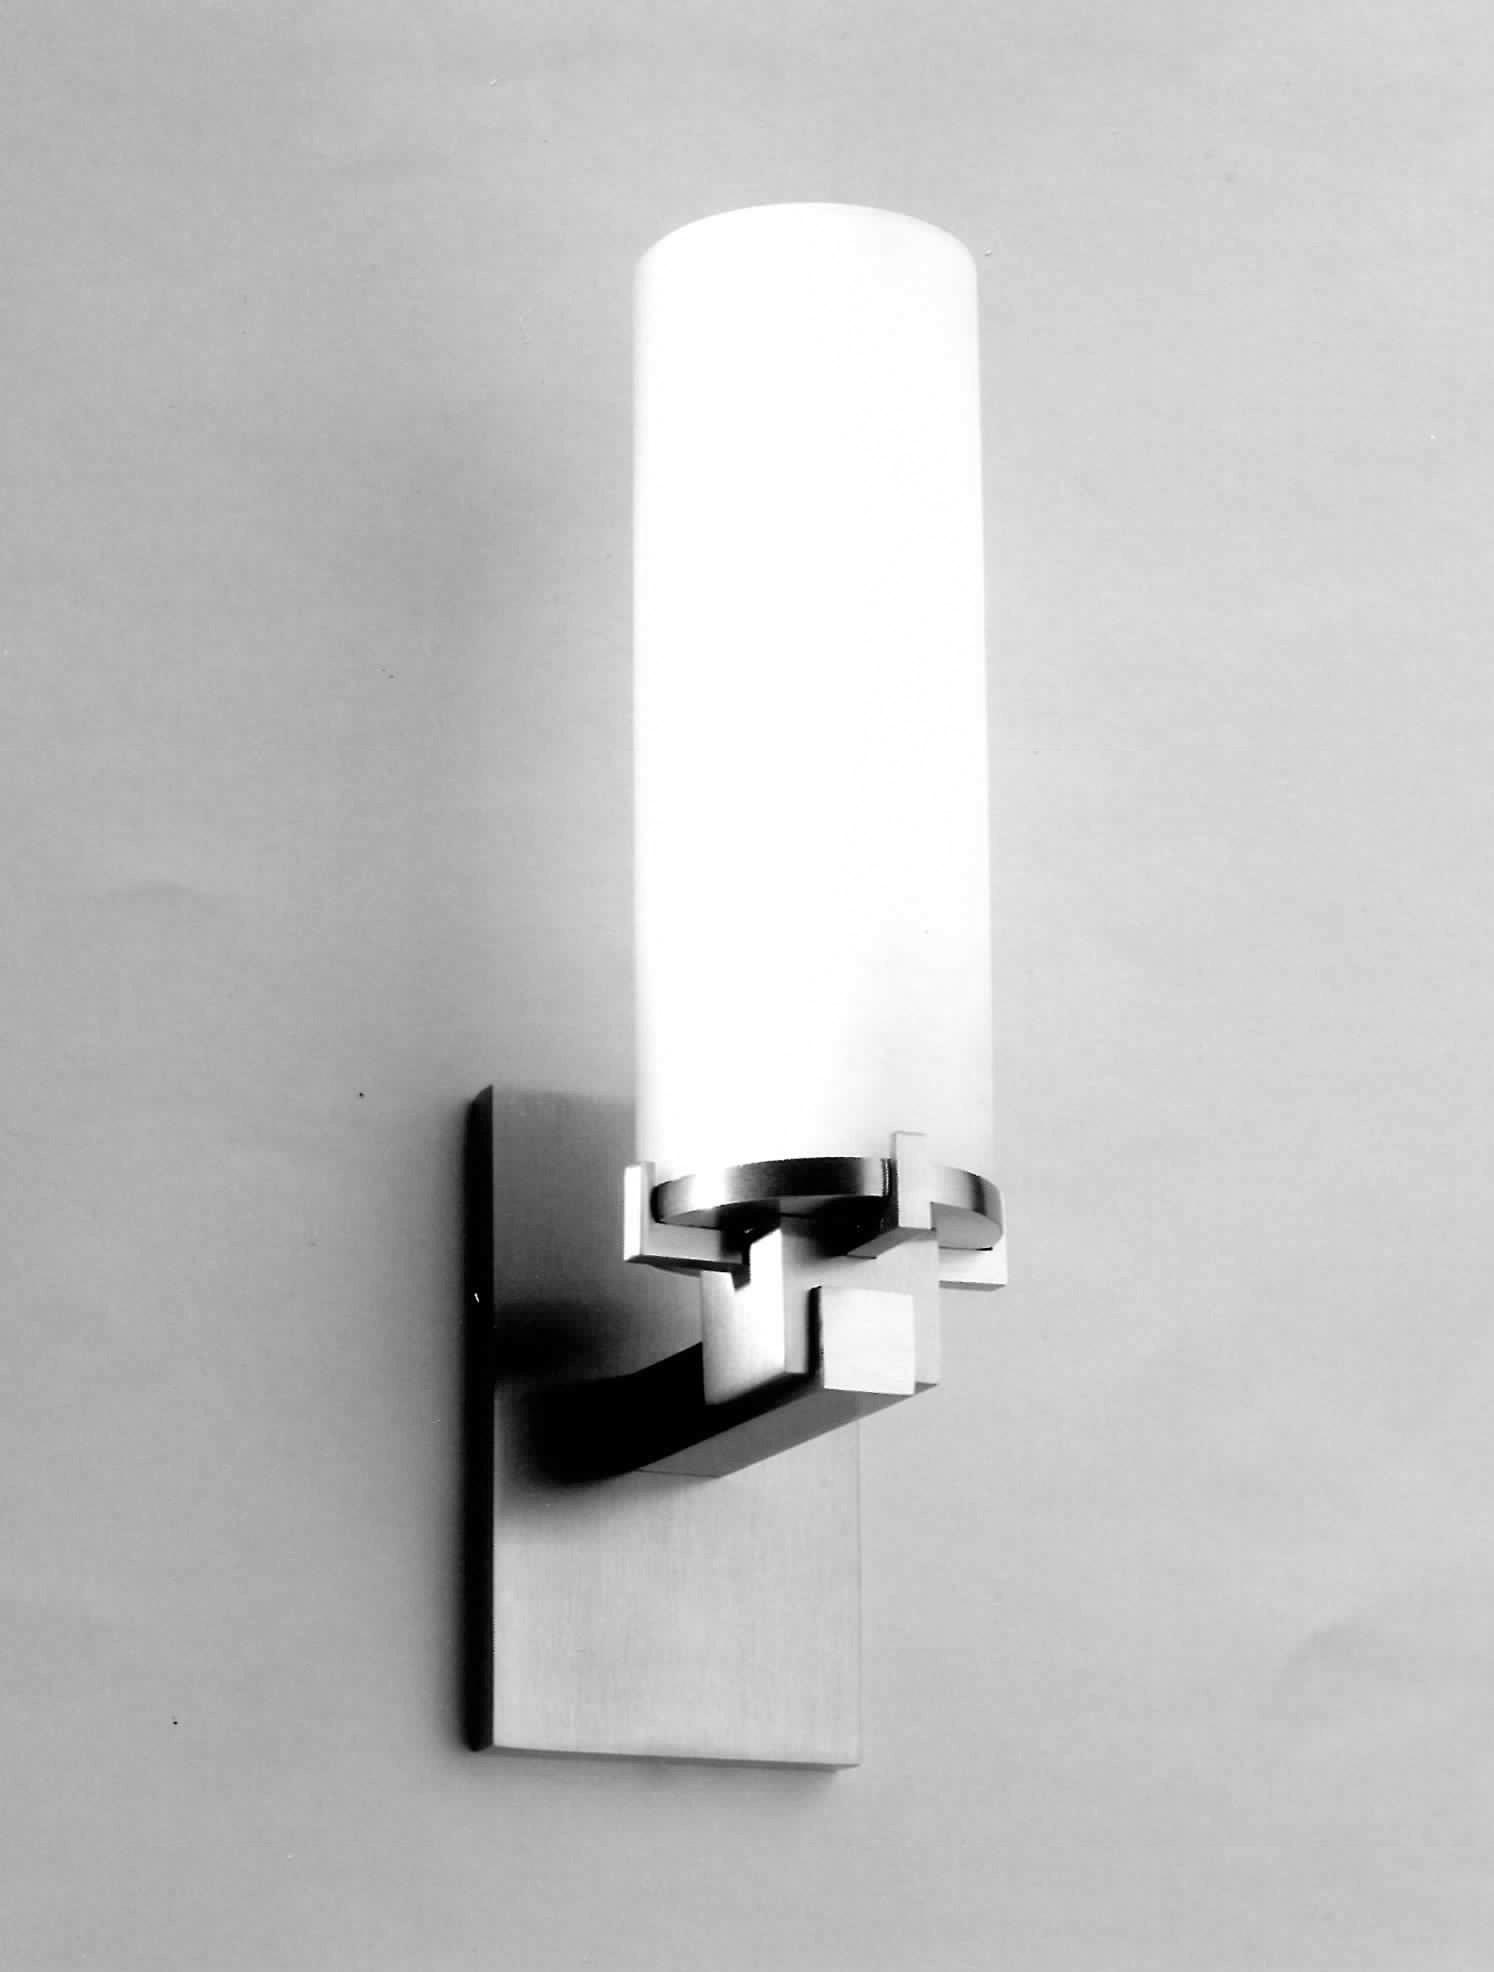 Calger Lighting Image 16